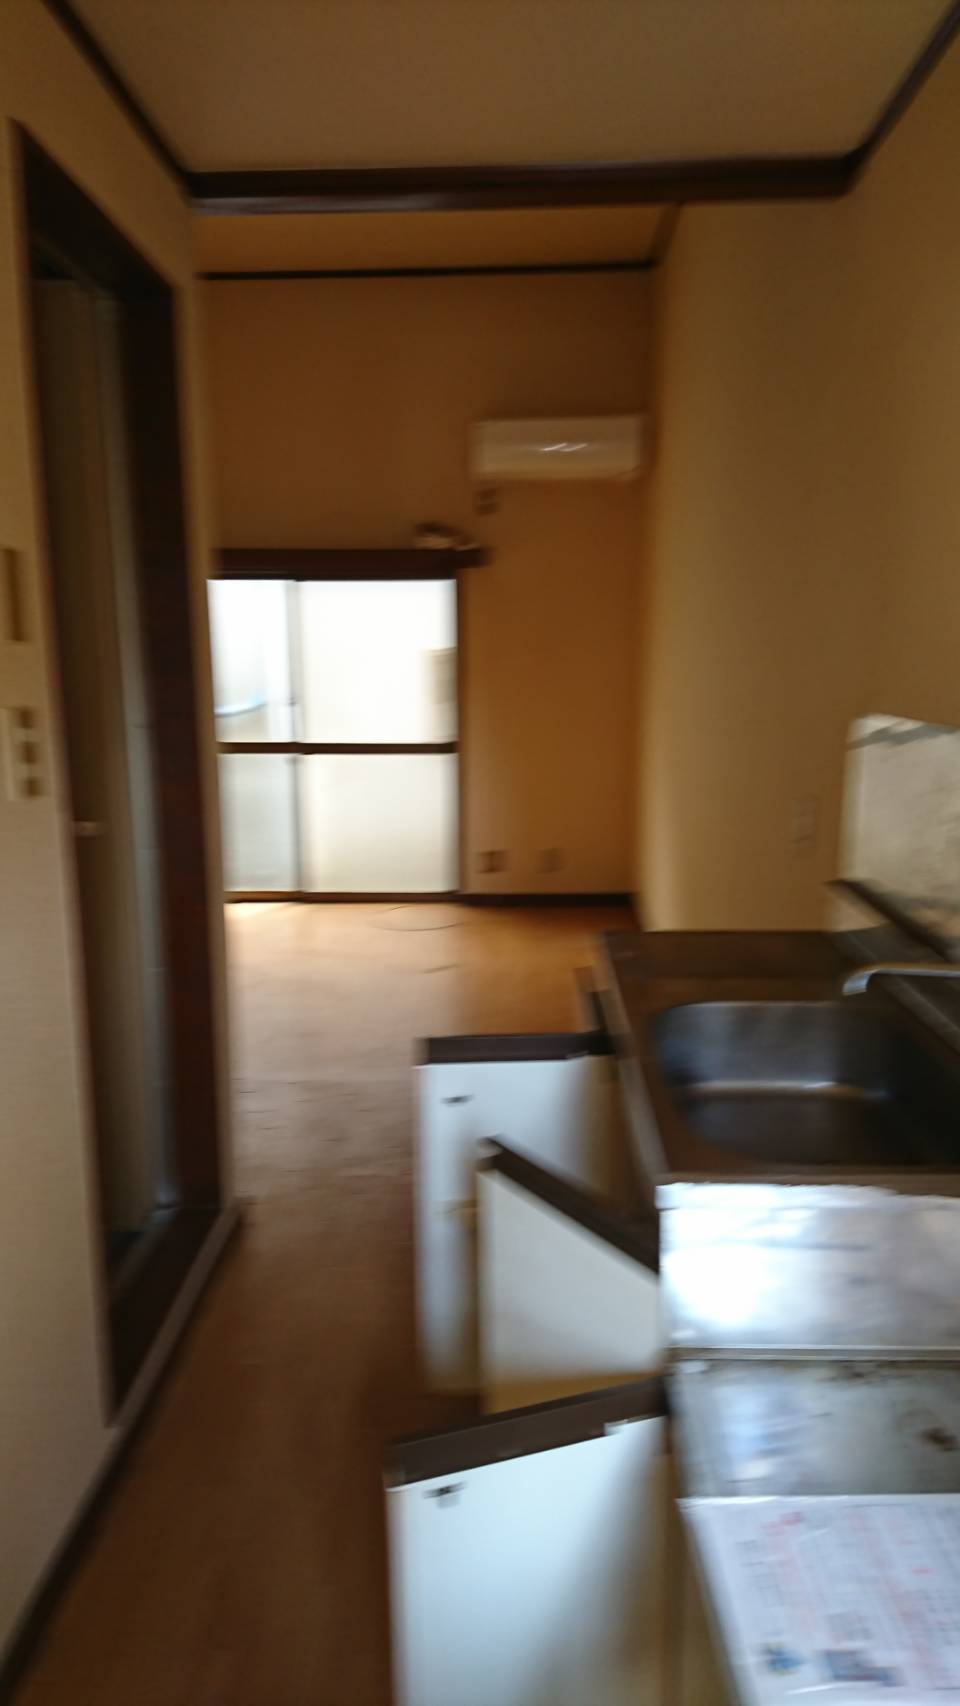 東京都東久留米市  アパート1K不要品(冷蔵庫、洗濯機、調理用品、洋服、洗剤などの生活用品、布団一式など)回収